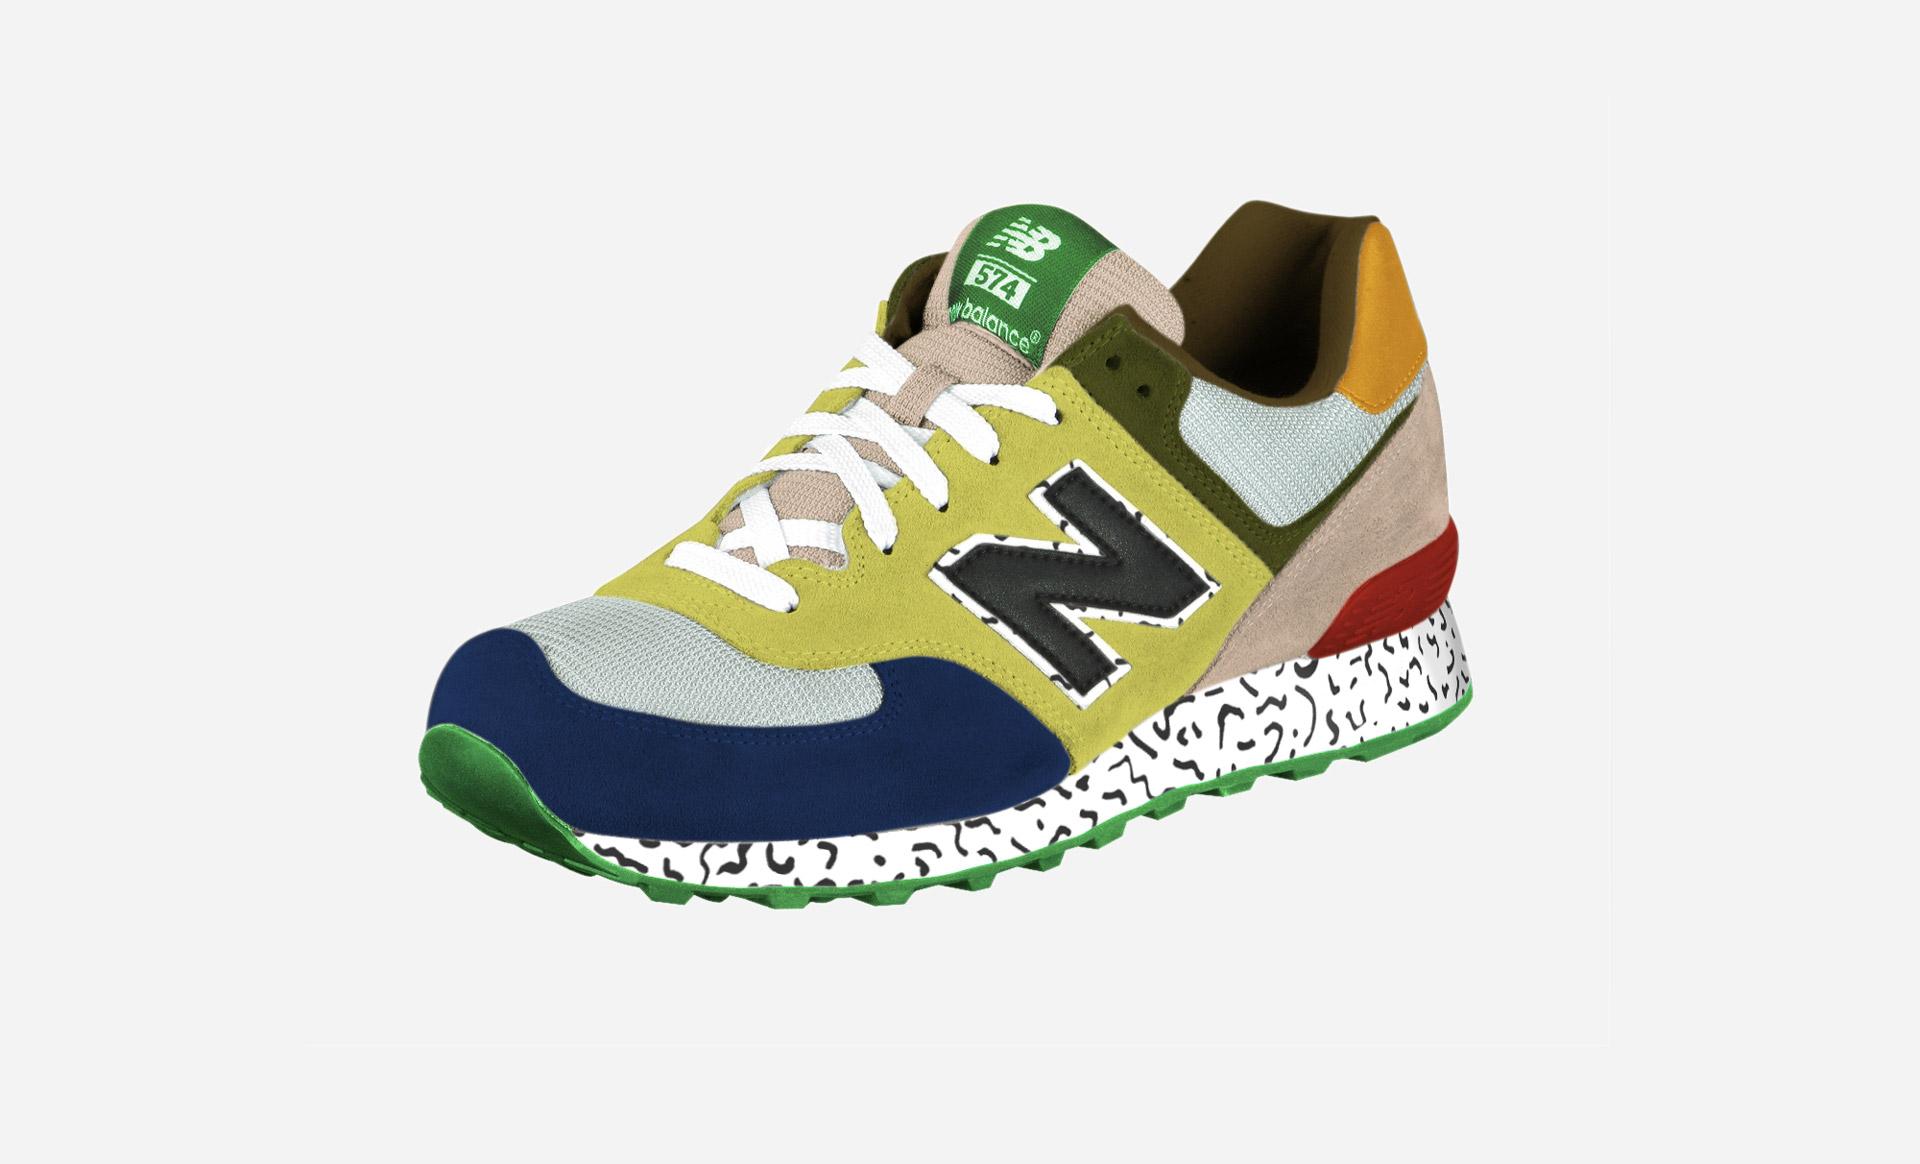 Tino Seubert - Ettore Sottsass Sneaker - New Balance